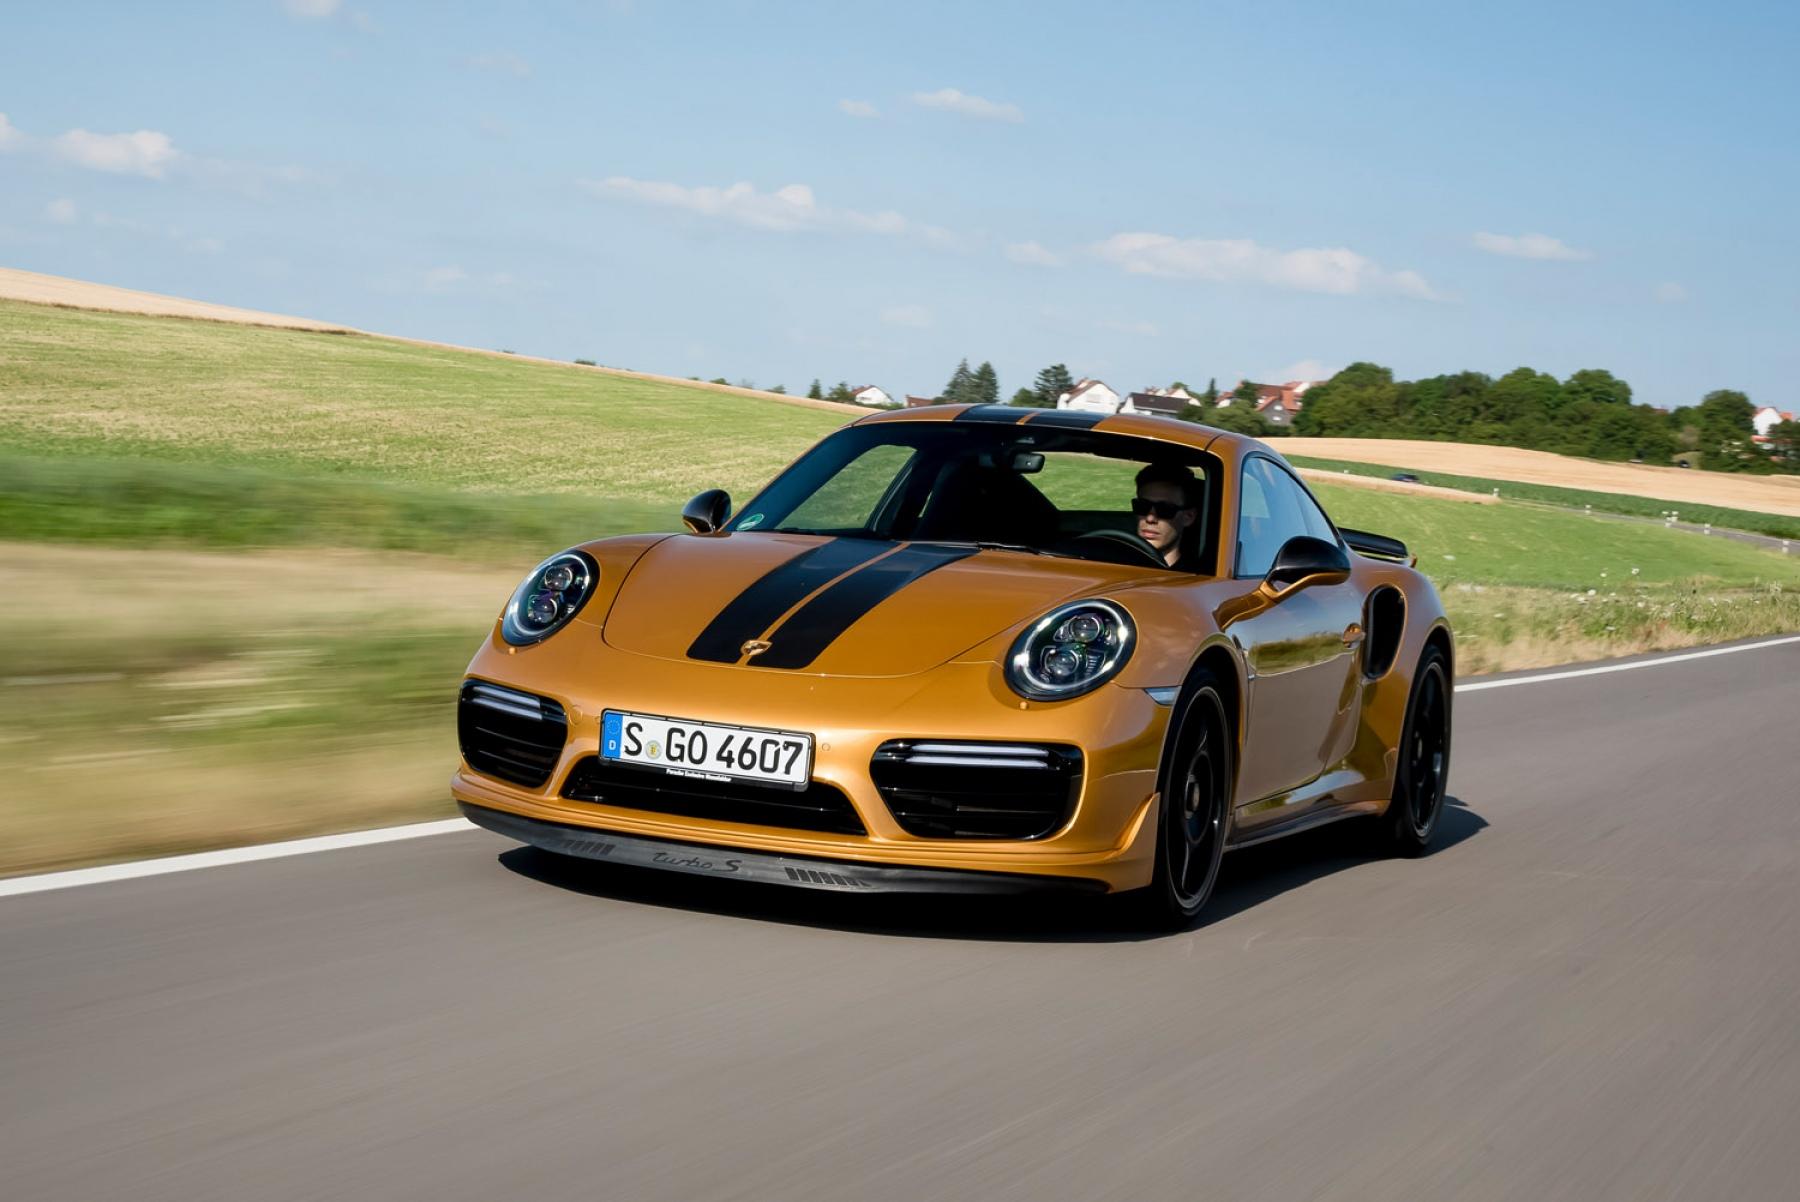 911 Turbo S Exclusive Series Golden Yellow Metallic